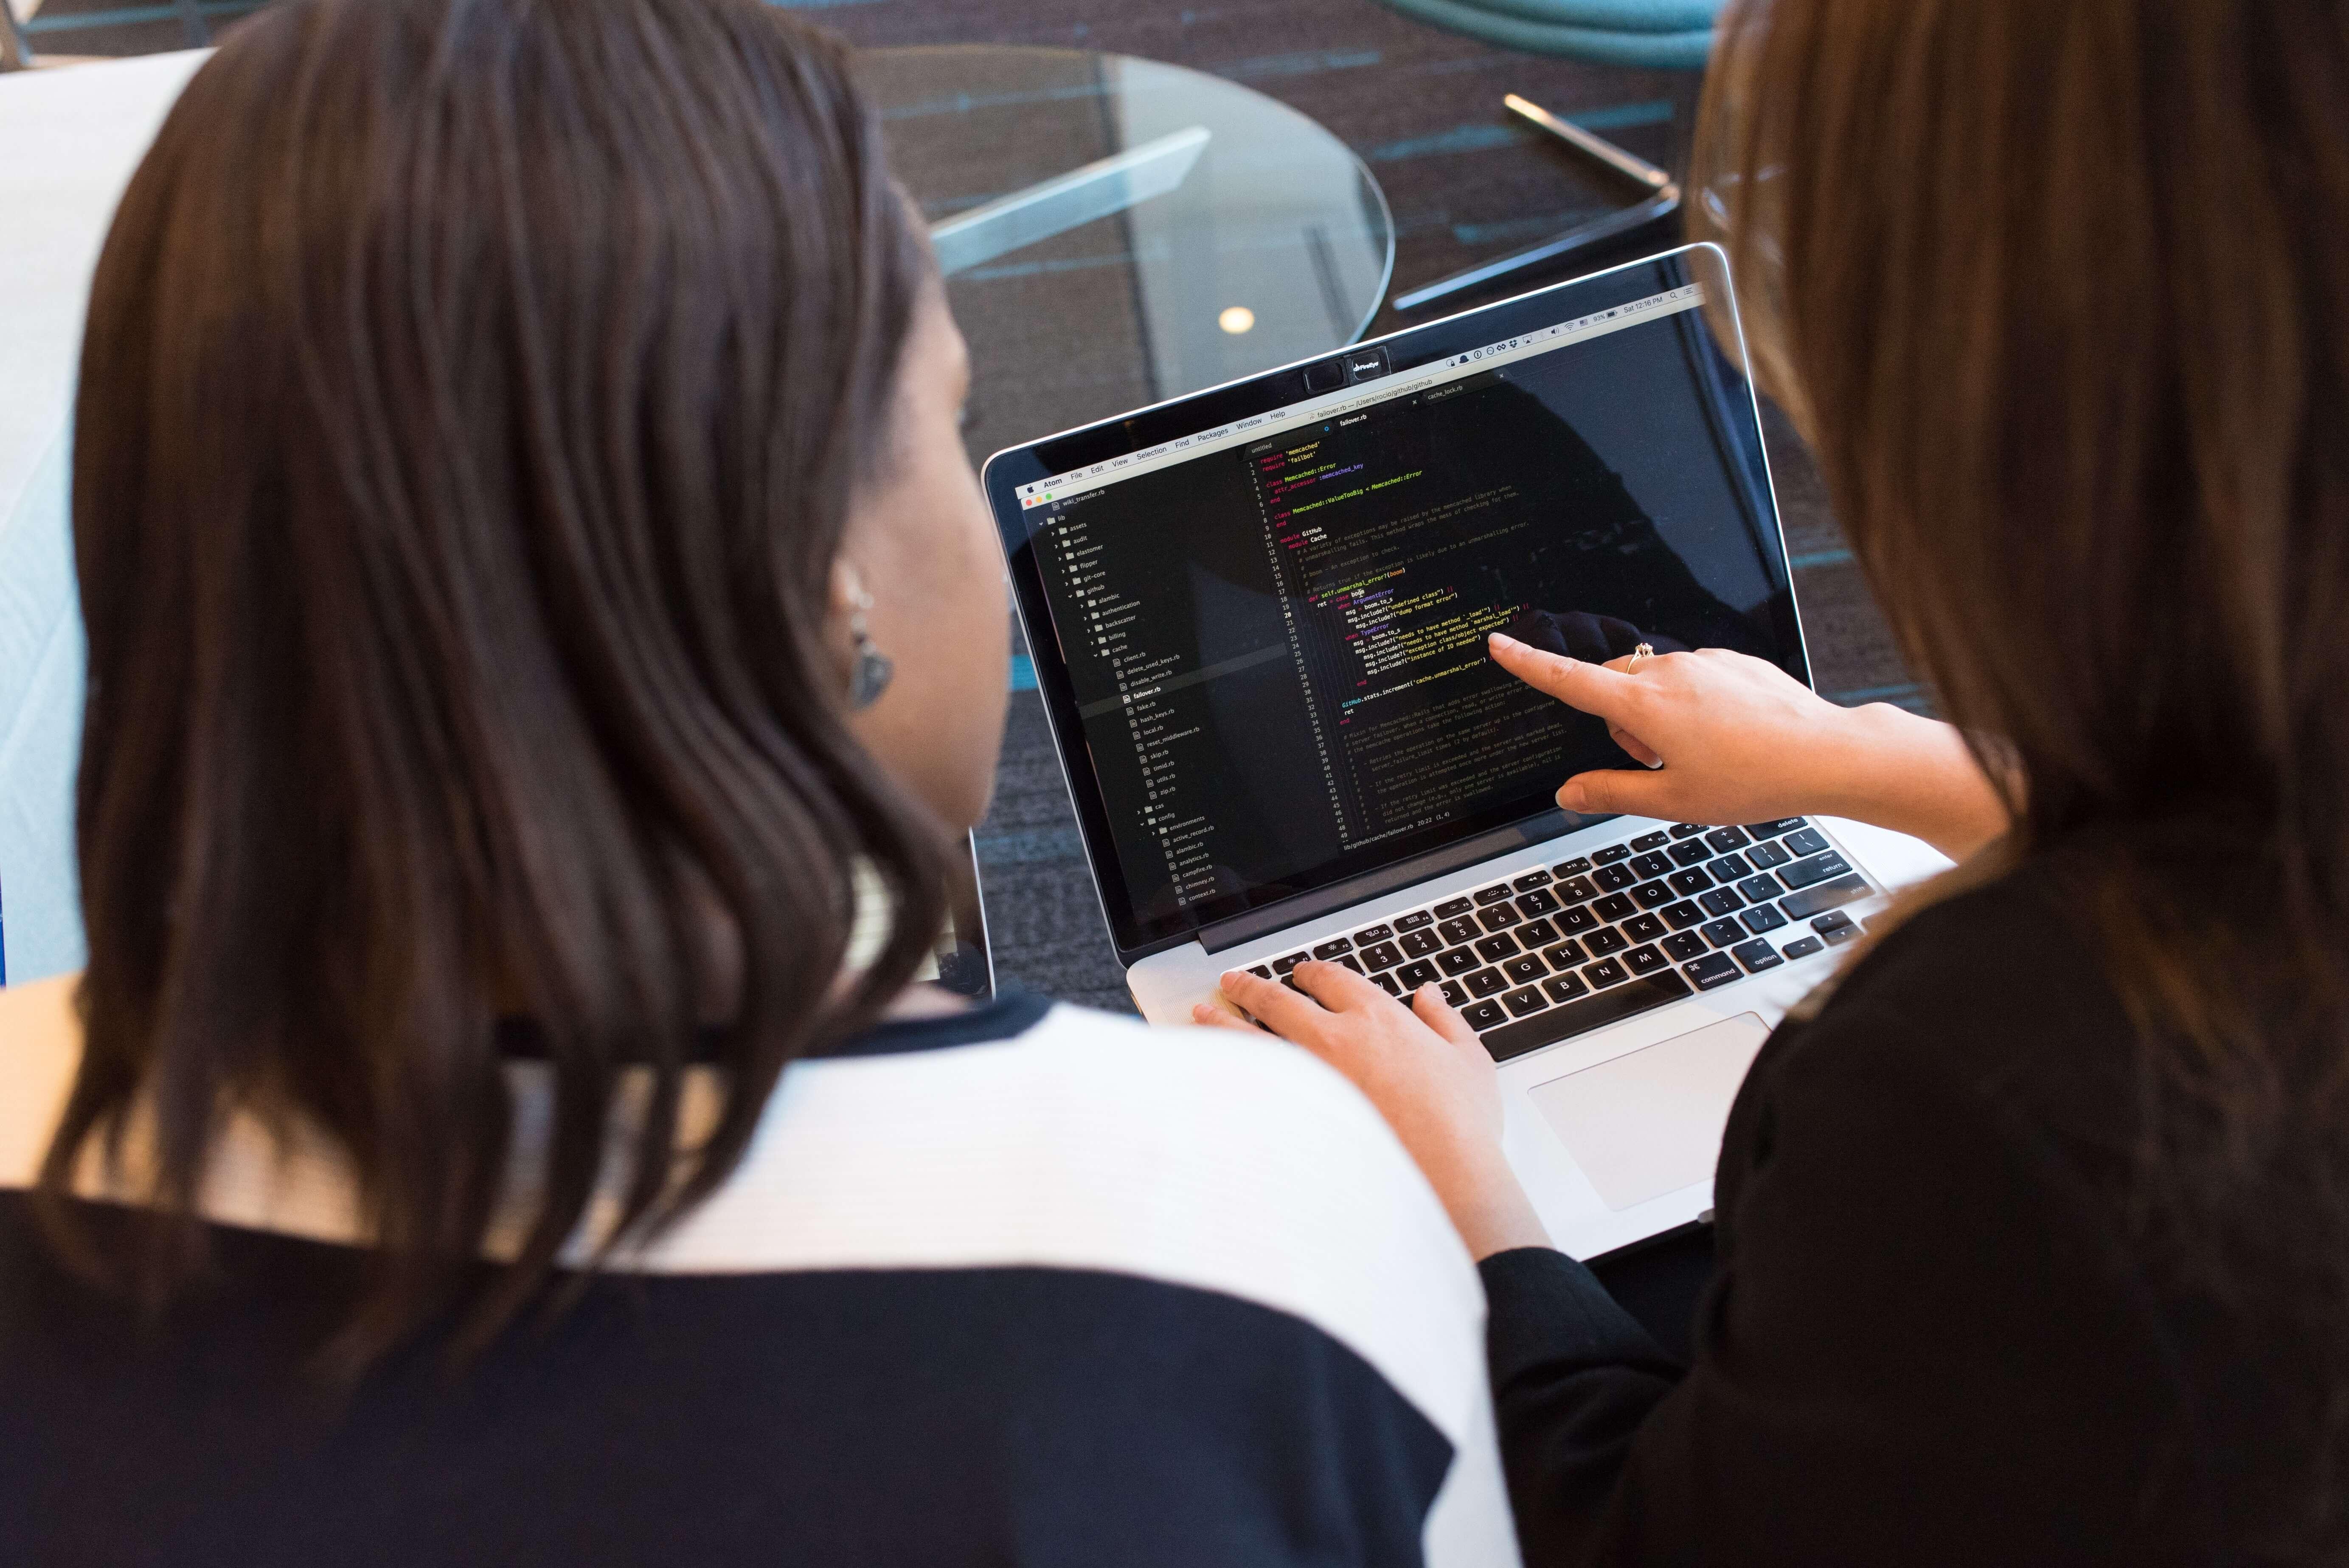 programming or coding